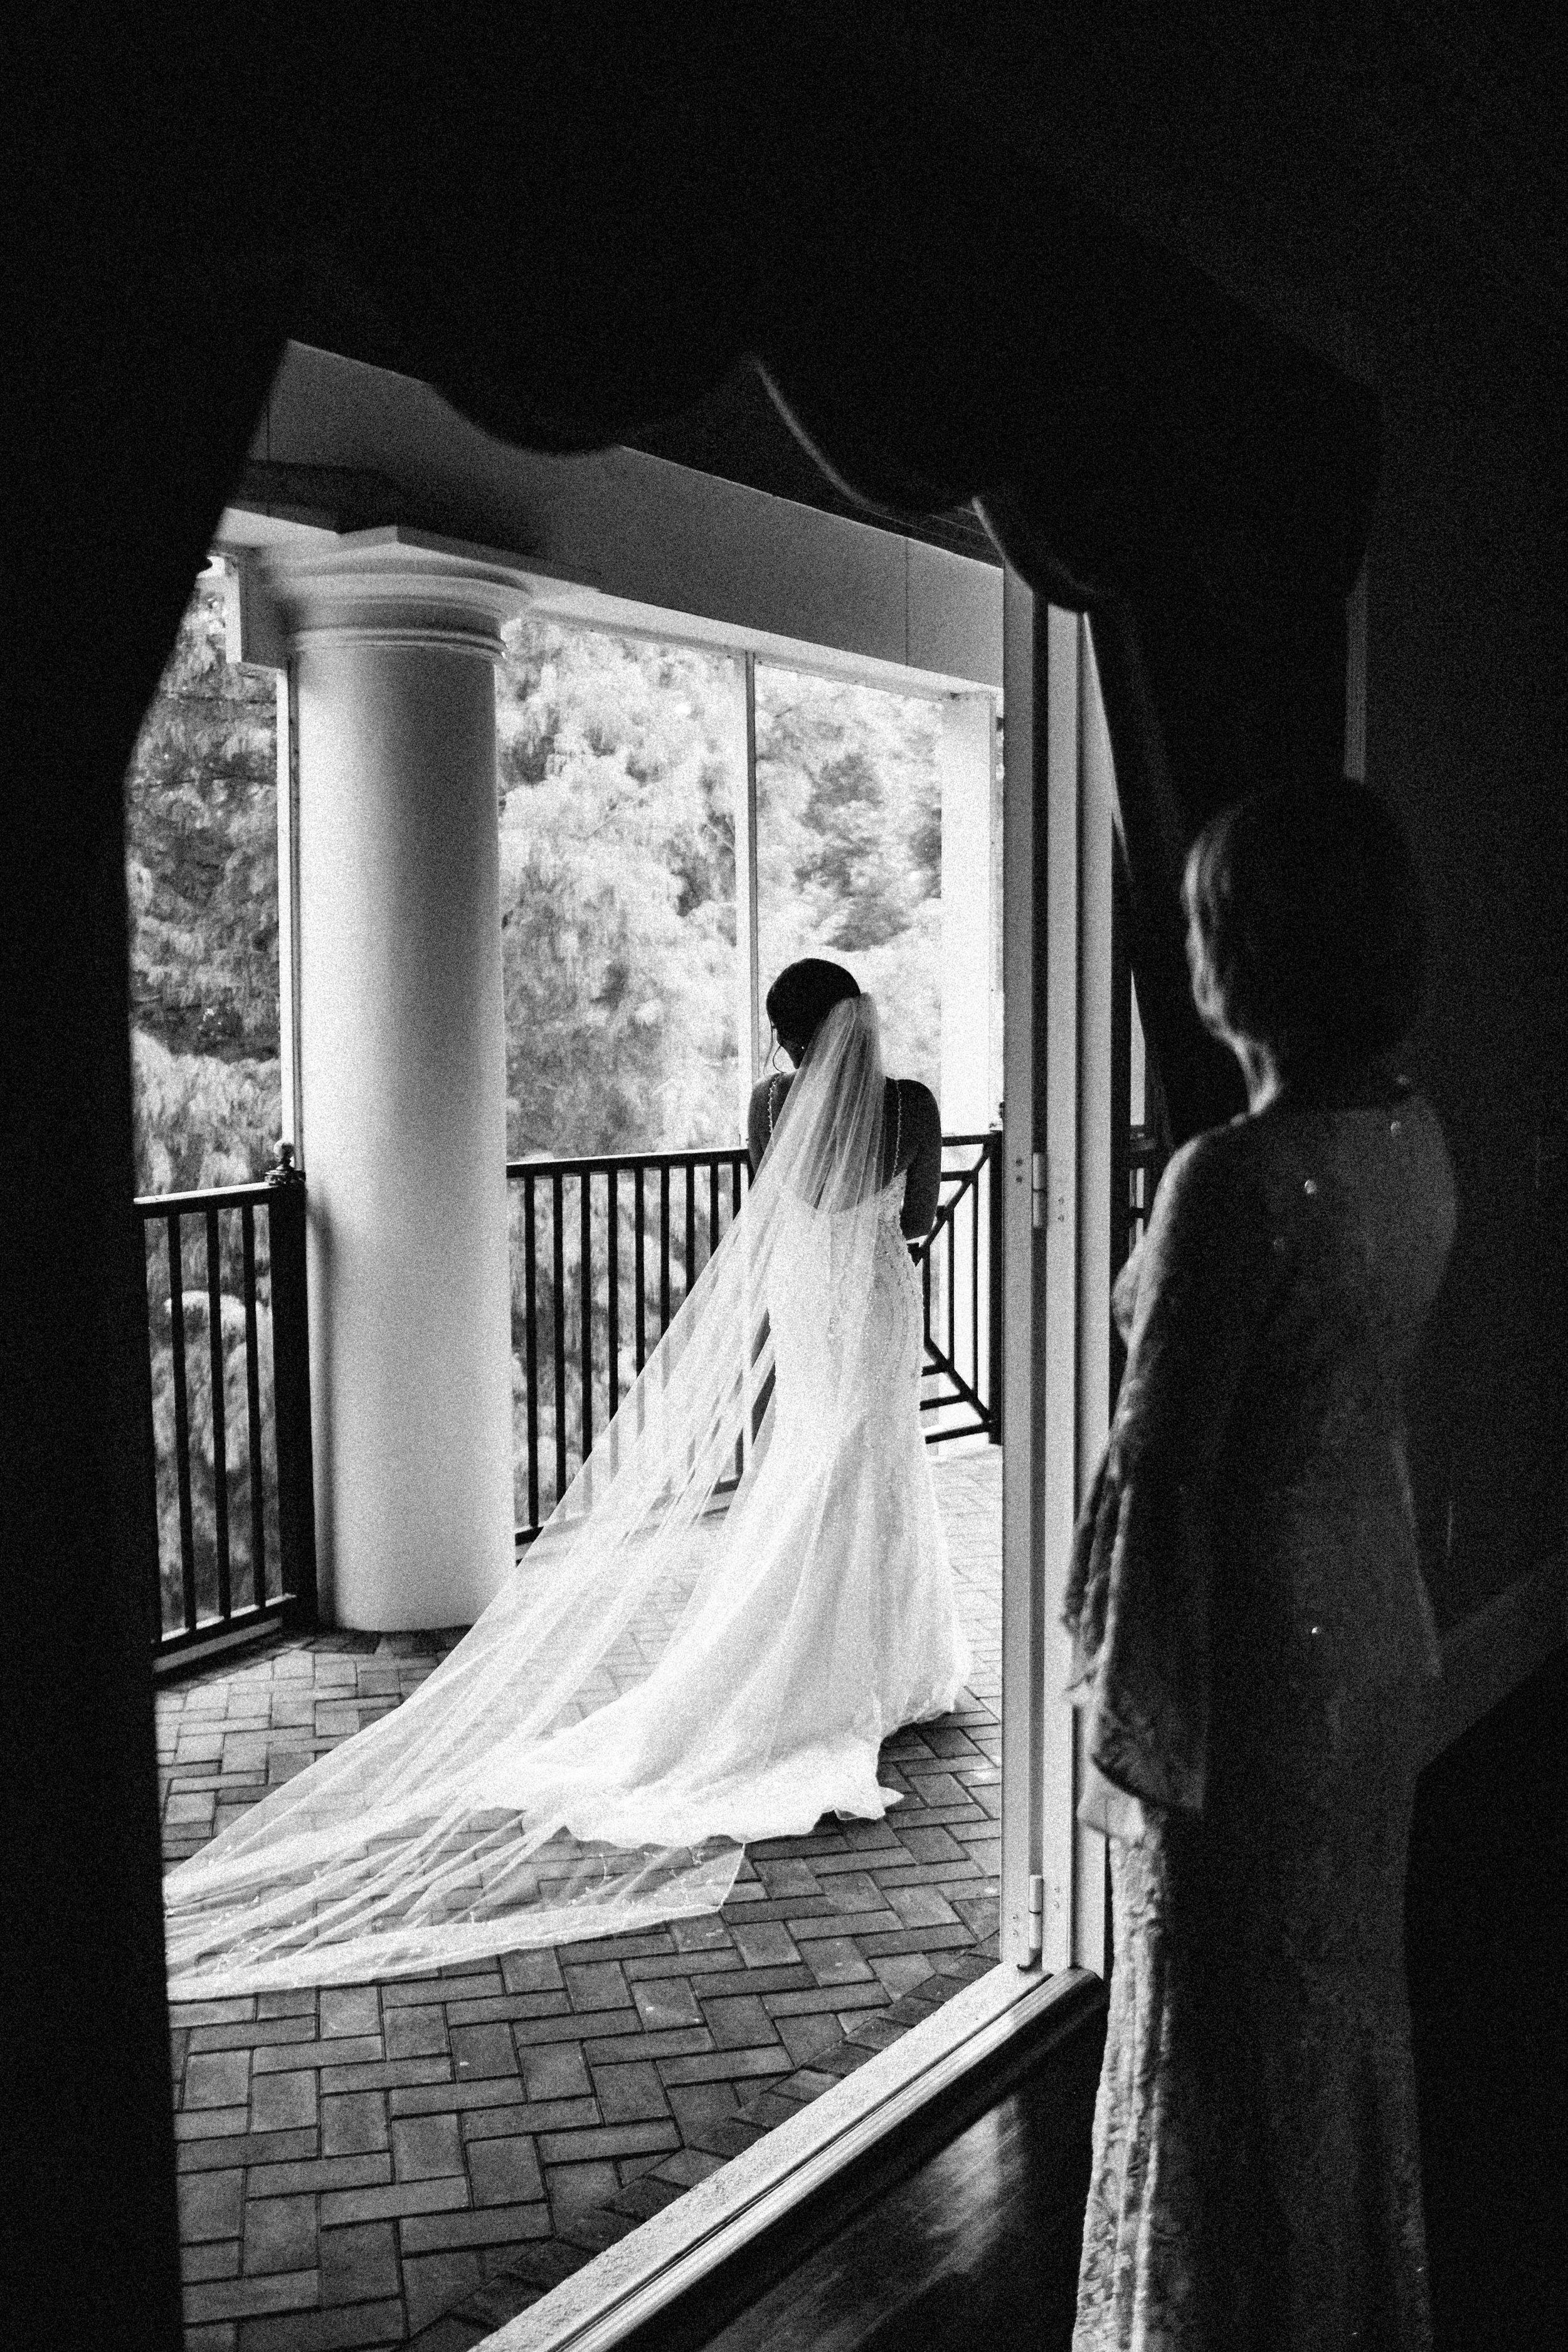 d35fe-luxmoregrandestatewedding.jpgluxmoregrandestatewedding.jpg